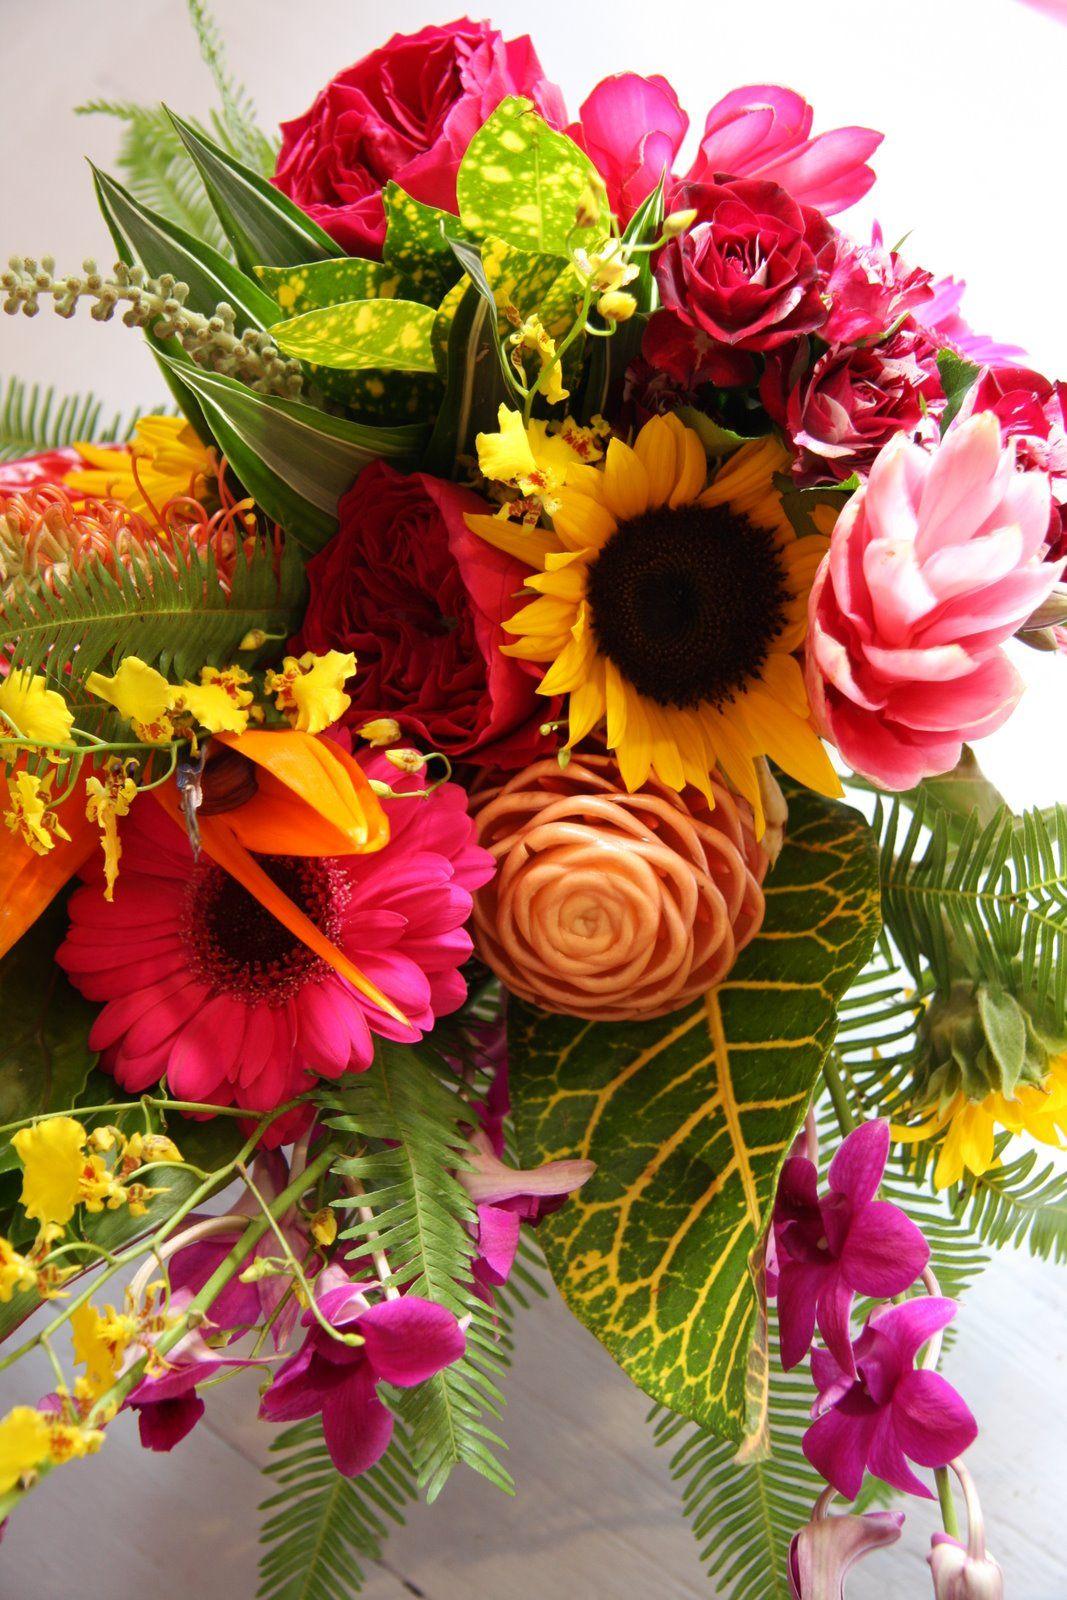 Japanese flower wedding arranging summer flower summer flower japanese flower wedding arranging summer flower summer flower centerpieces izmirmasajfo